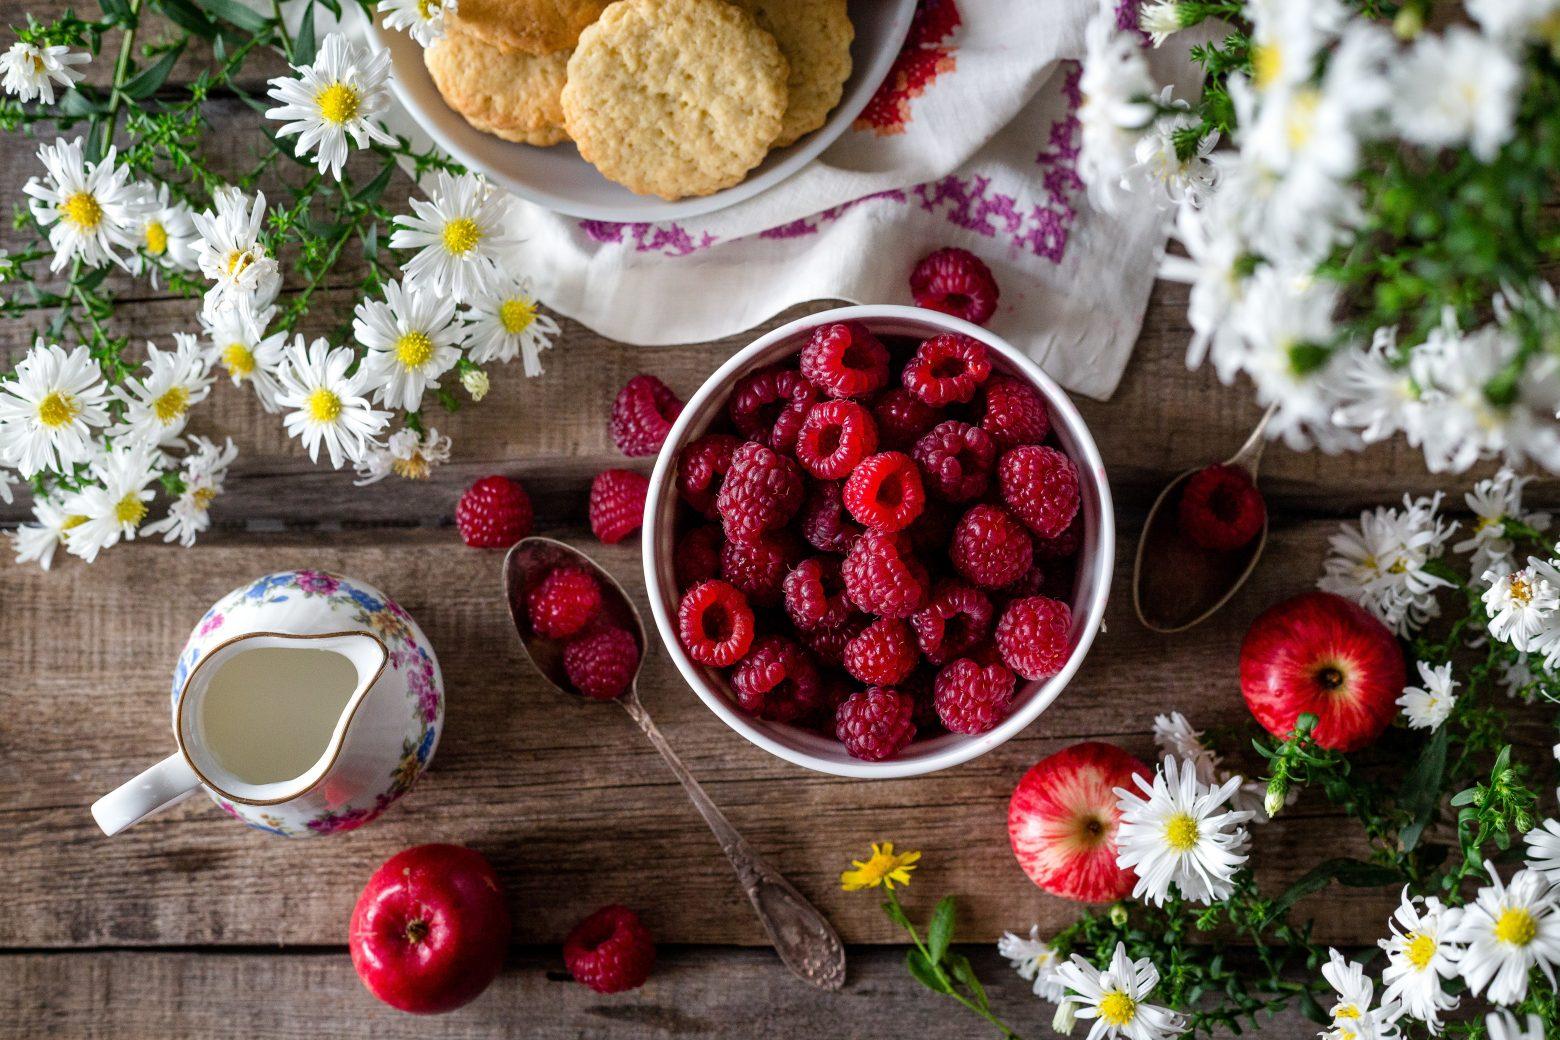 raspberry-2023404